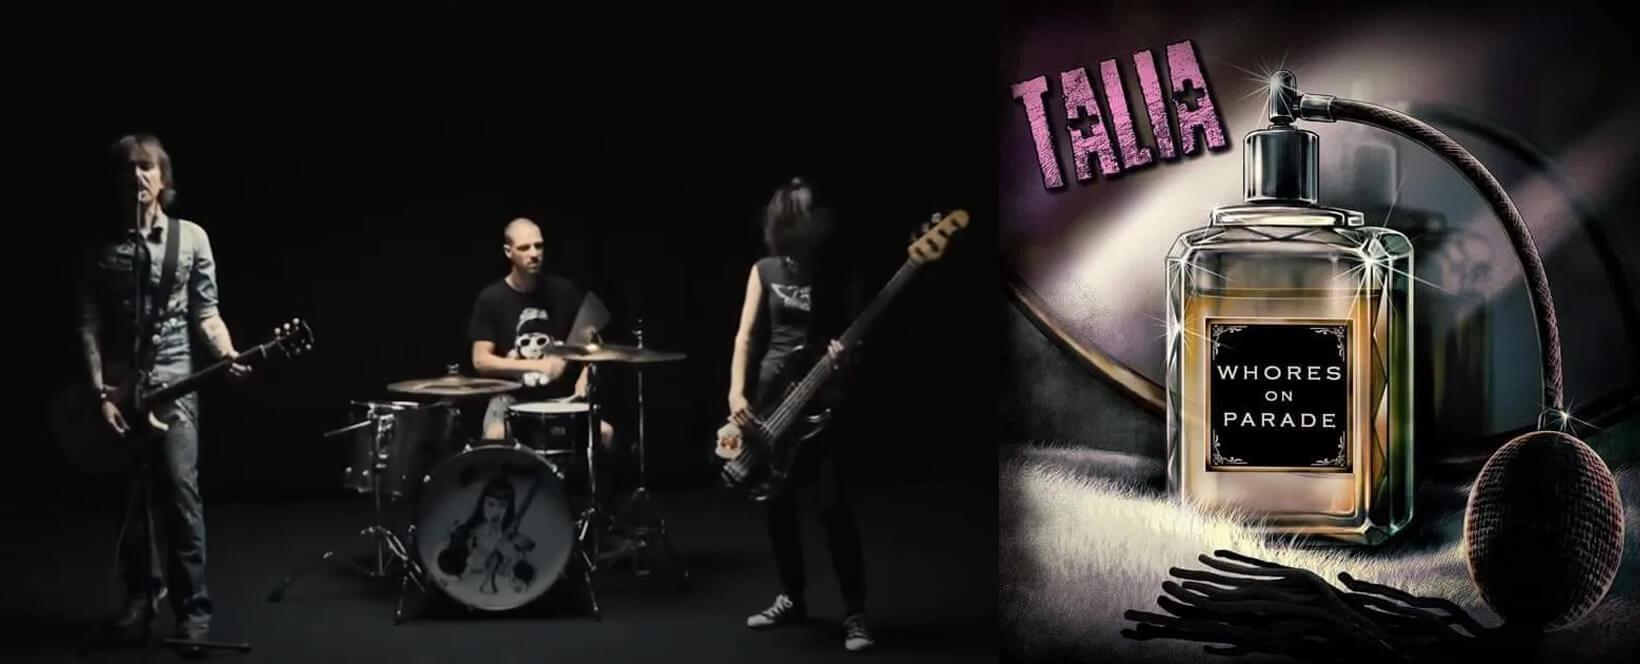 BC-358-Album - TALiA (the band) Mob : Whores on Parade - Radio Galaxie 98.5FM